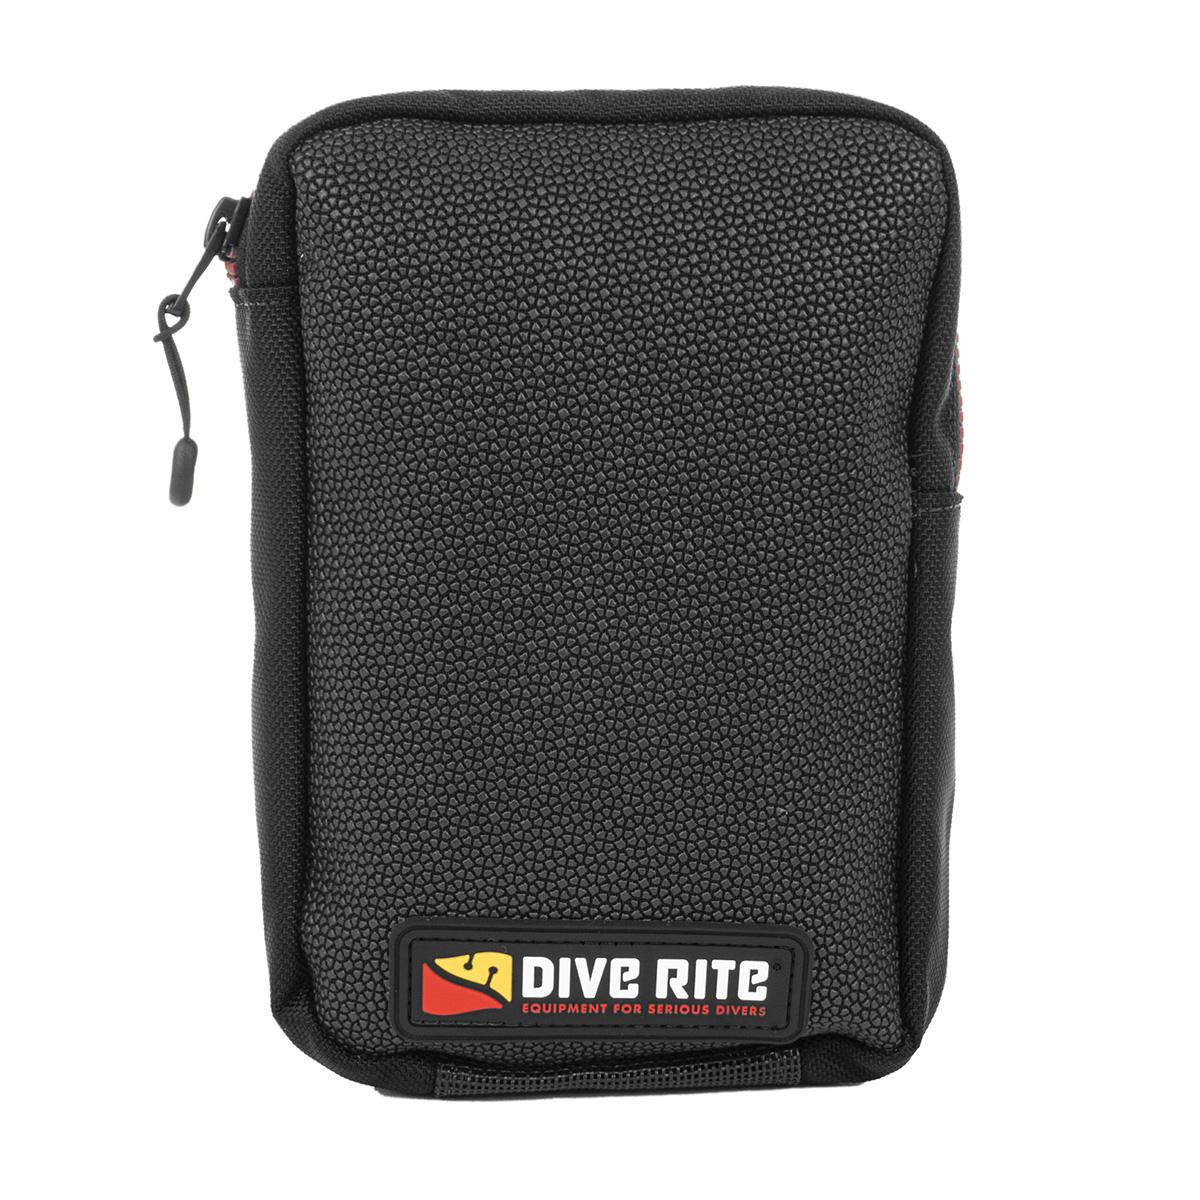 DIVE RITE Bellows Vertical Zipper Pocket with Daisy Chain (AC3203)